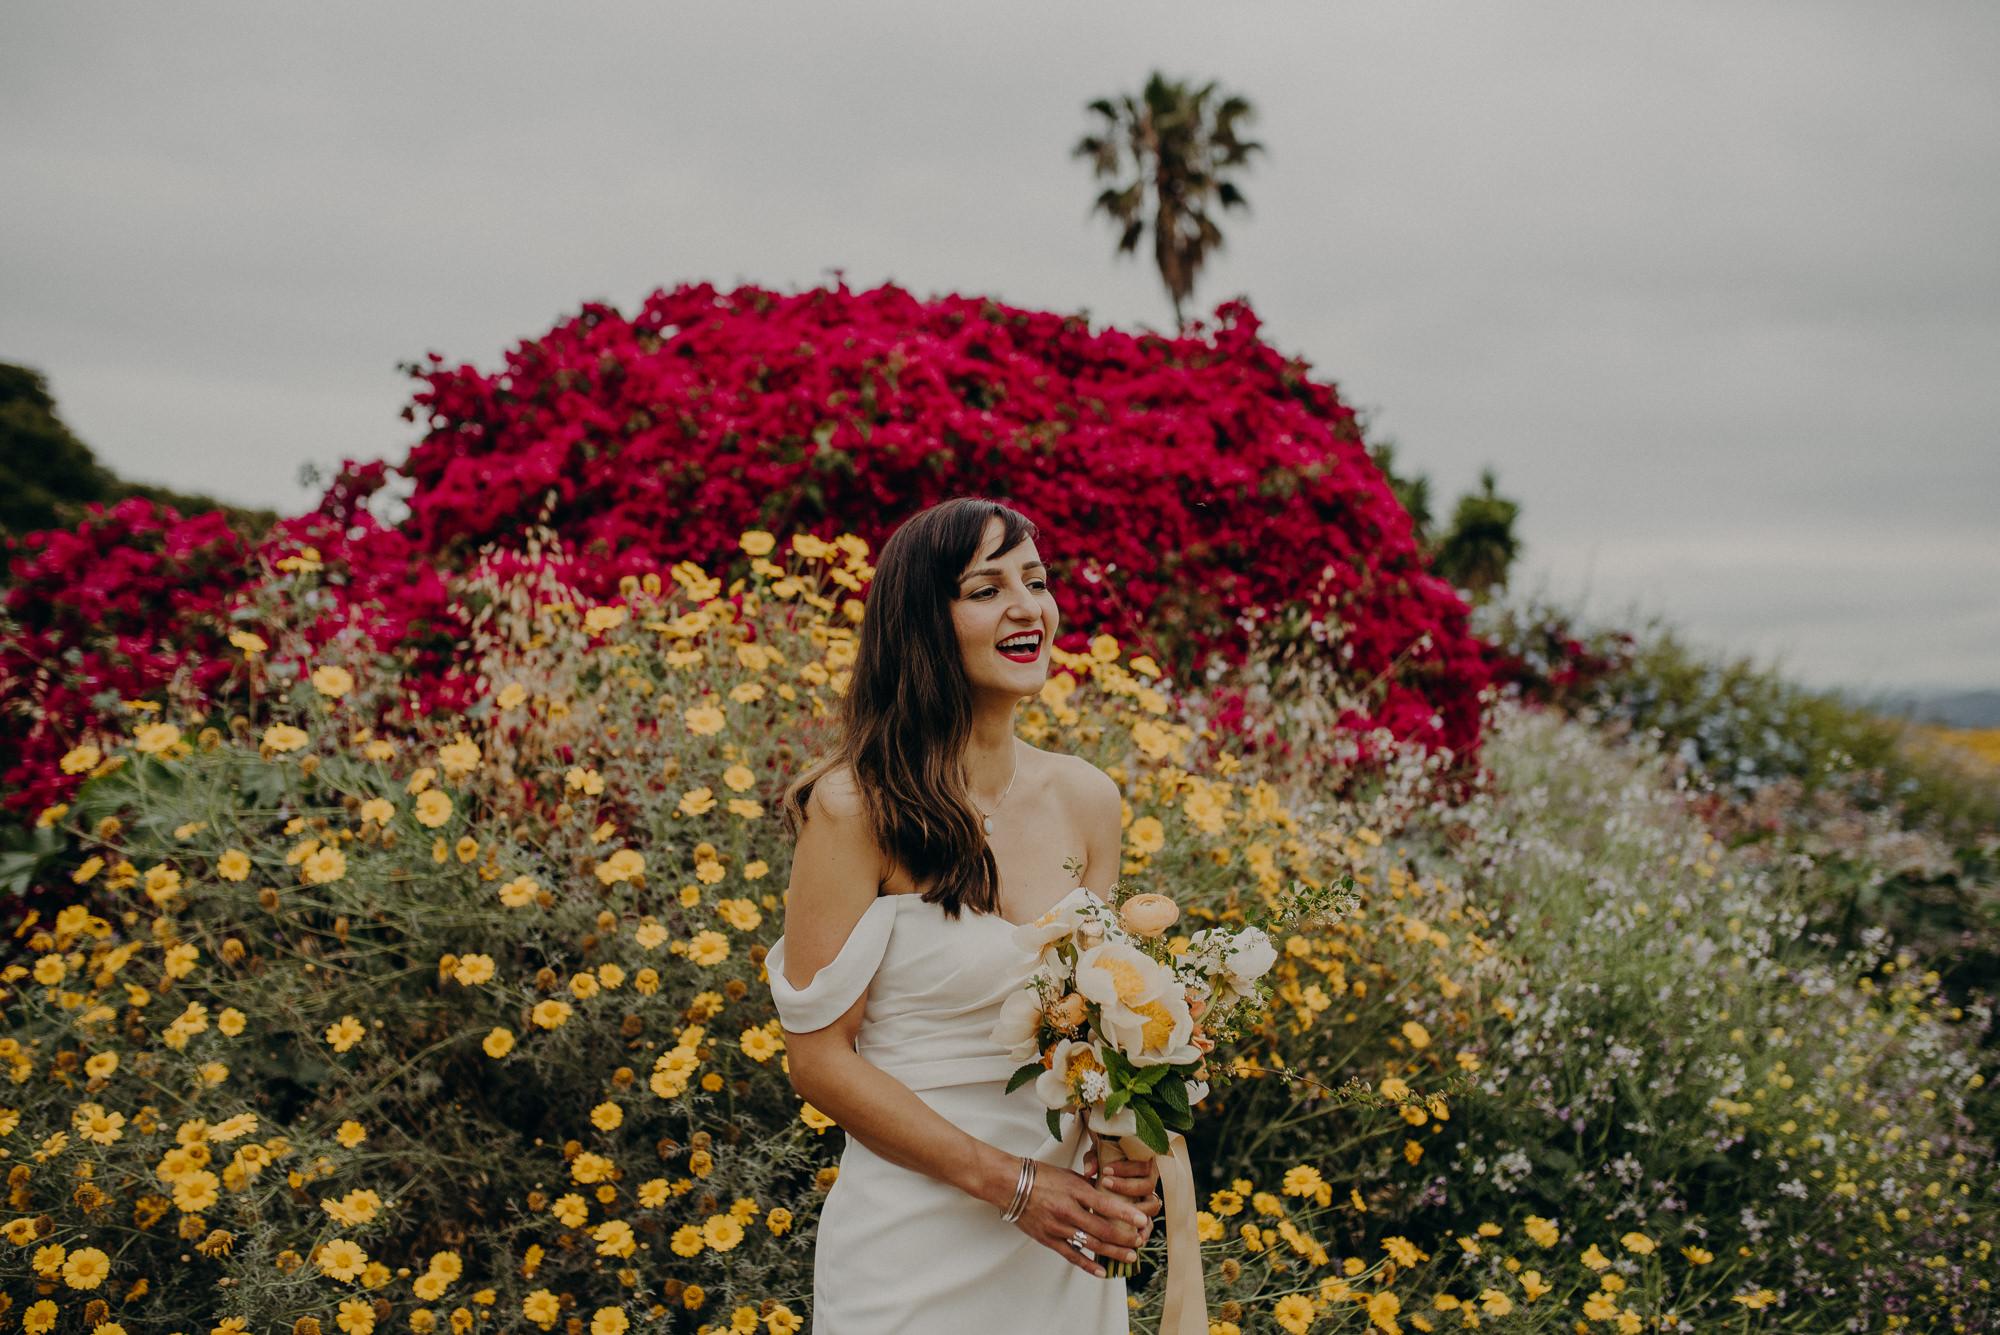 elopement photographer in los angeles - la wedding photographer - isaiahandtaylor.com-005.jpg